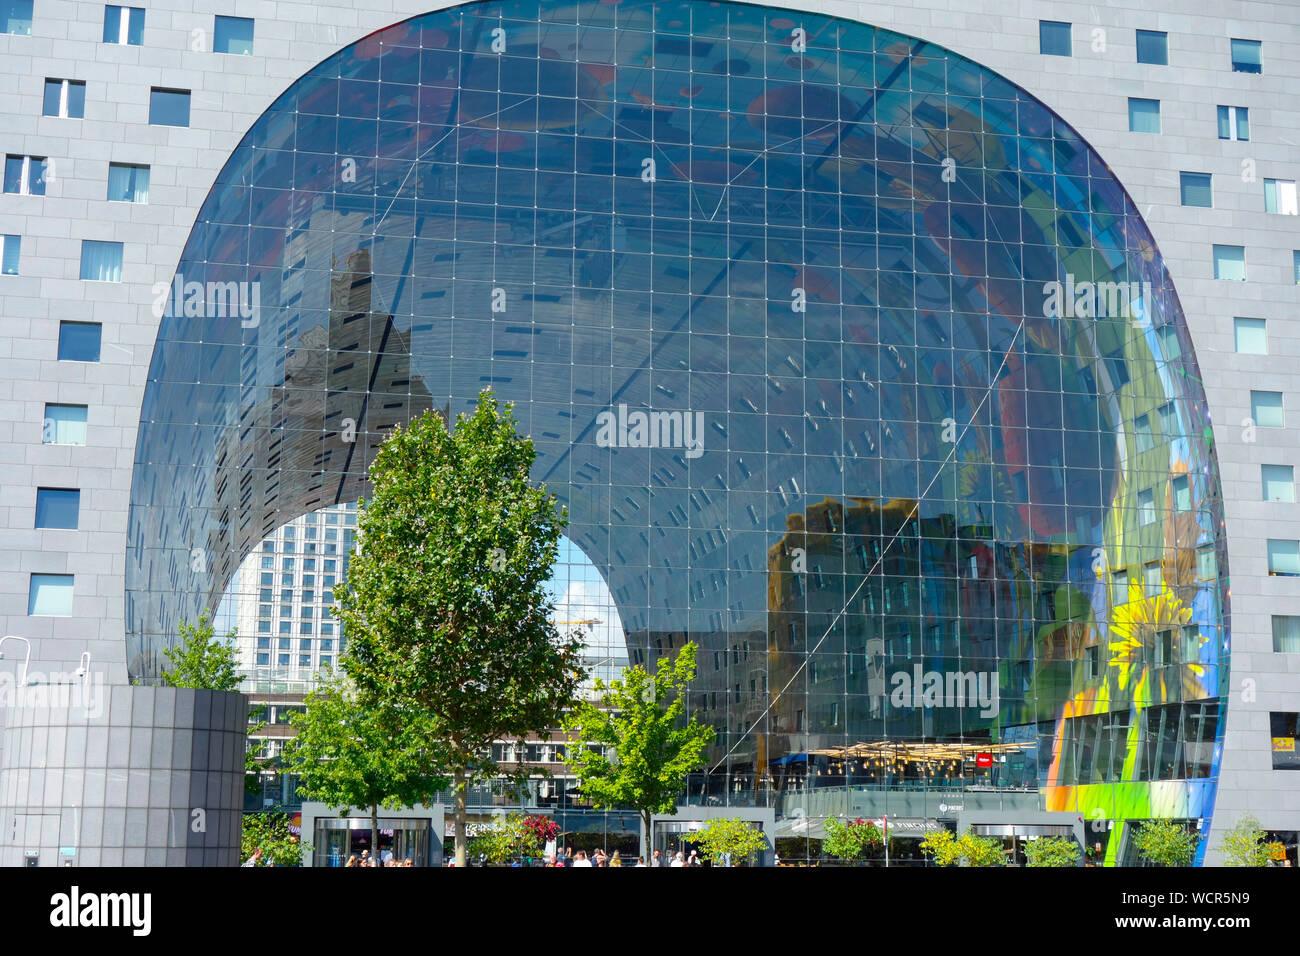 Market Hall Markthal Rotterdam, the Netherlands. Stock Photo